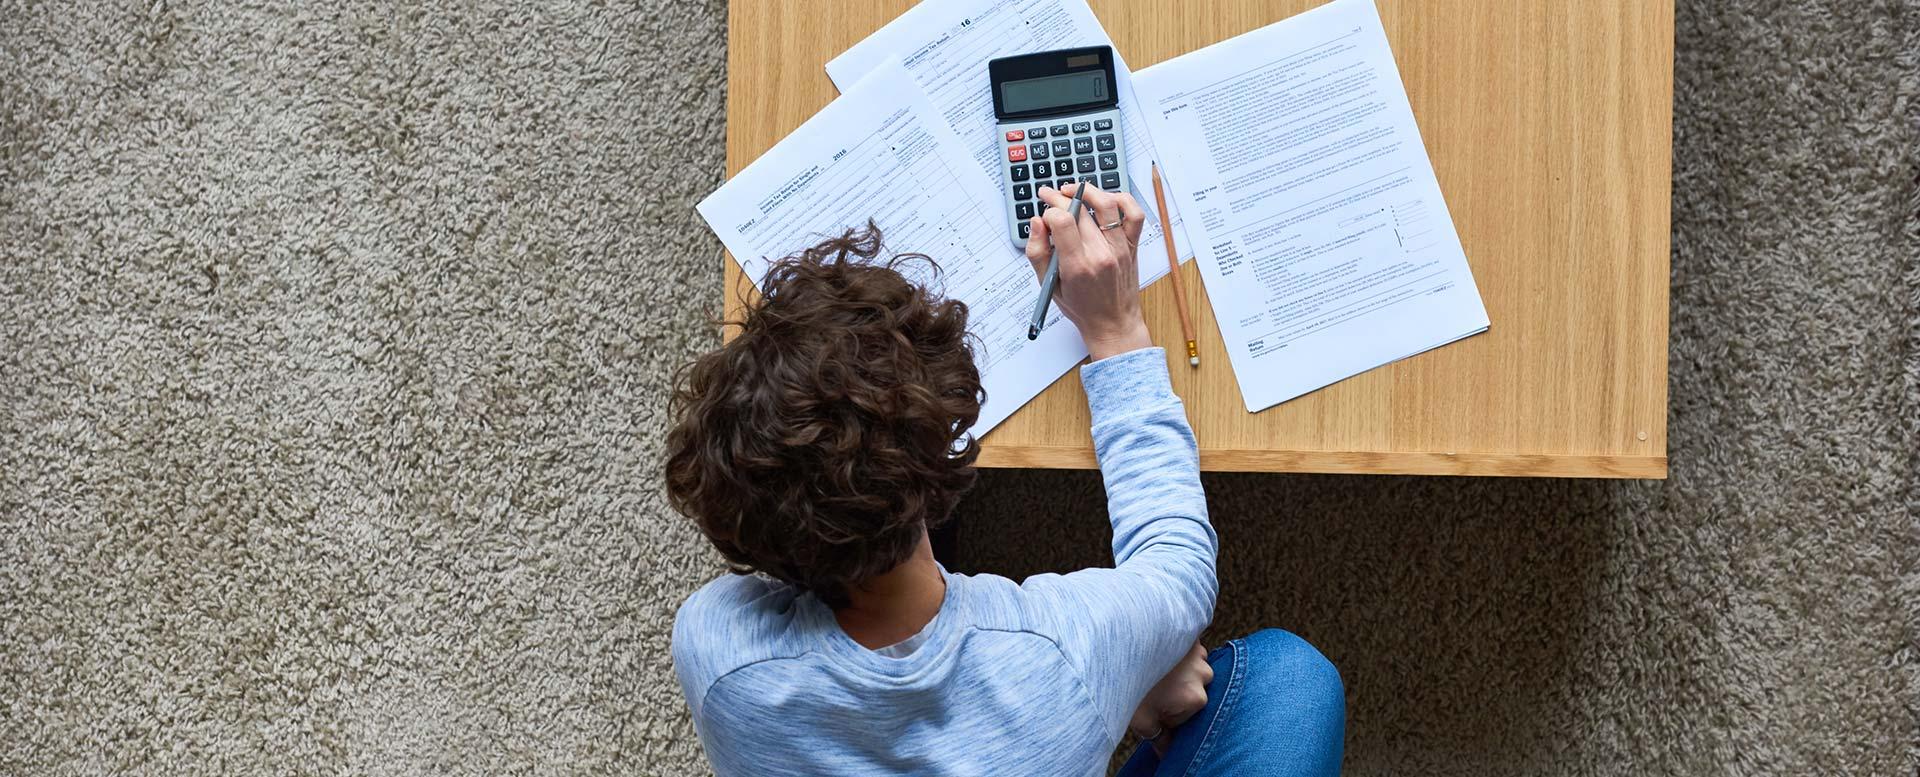 Steuererklärung Fristen 2021